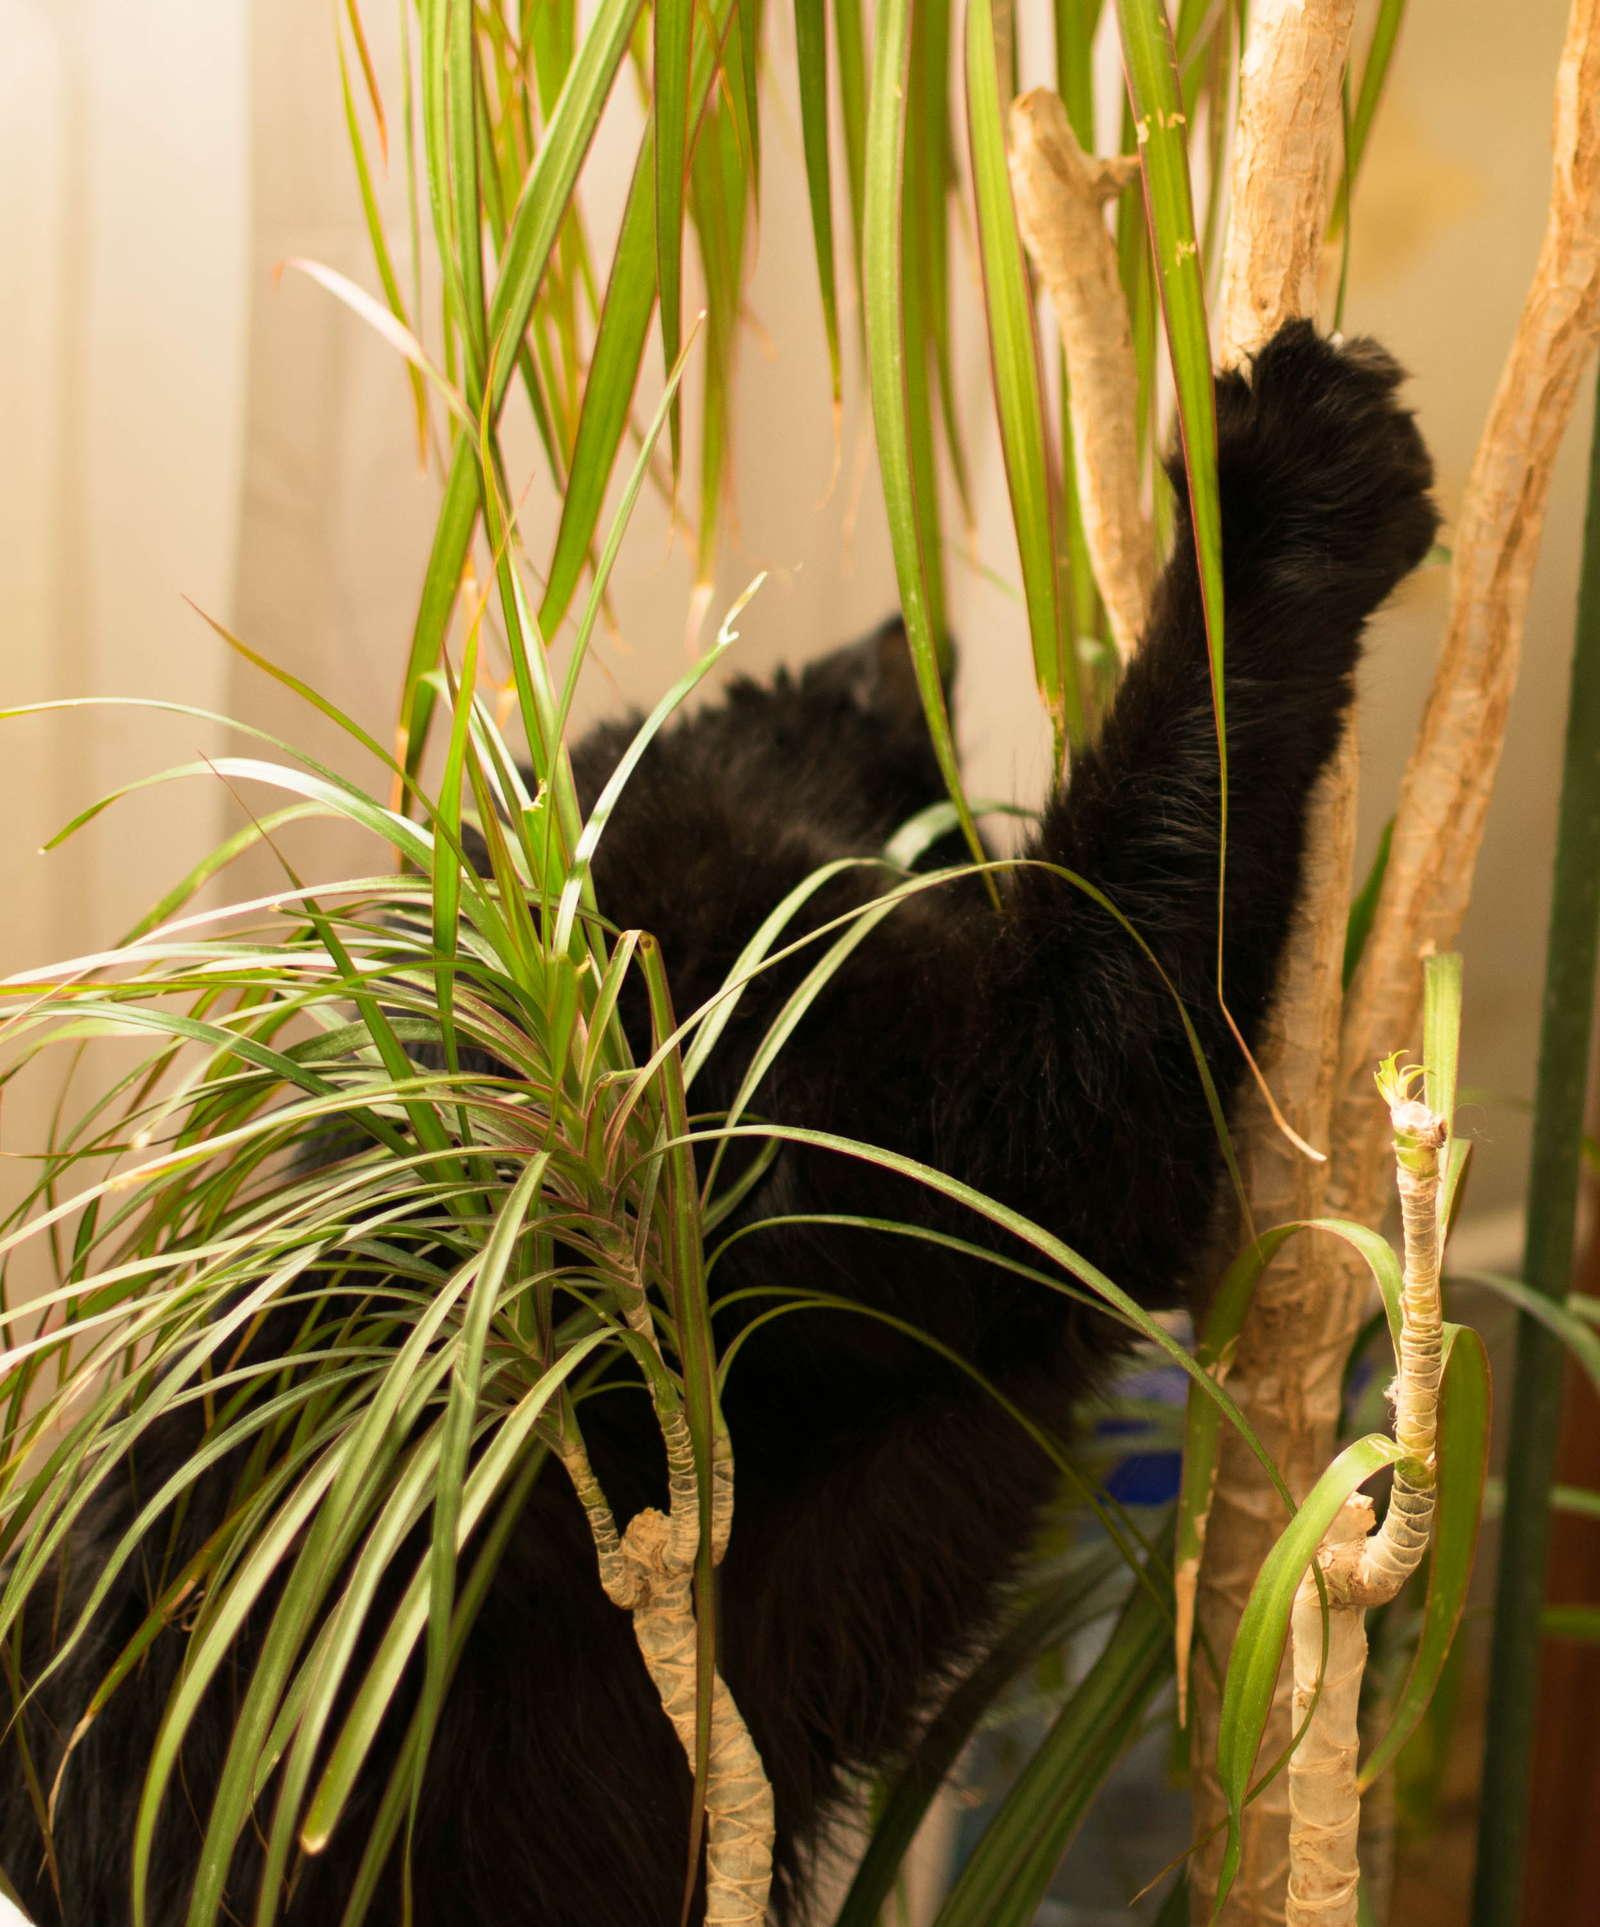 yucca palme ist die yucca palme giftig plantura. Black Bedroom Furniture Sets. Home Design Ideas